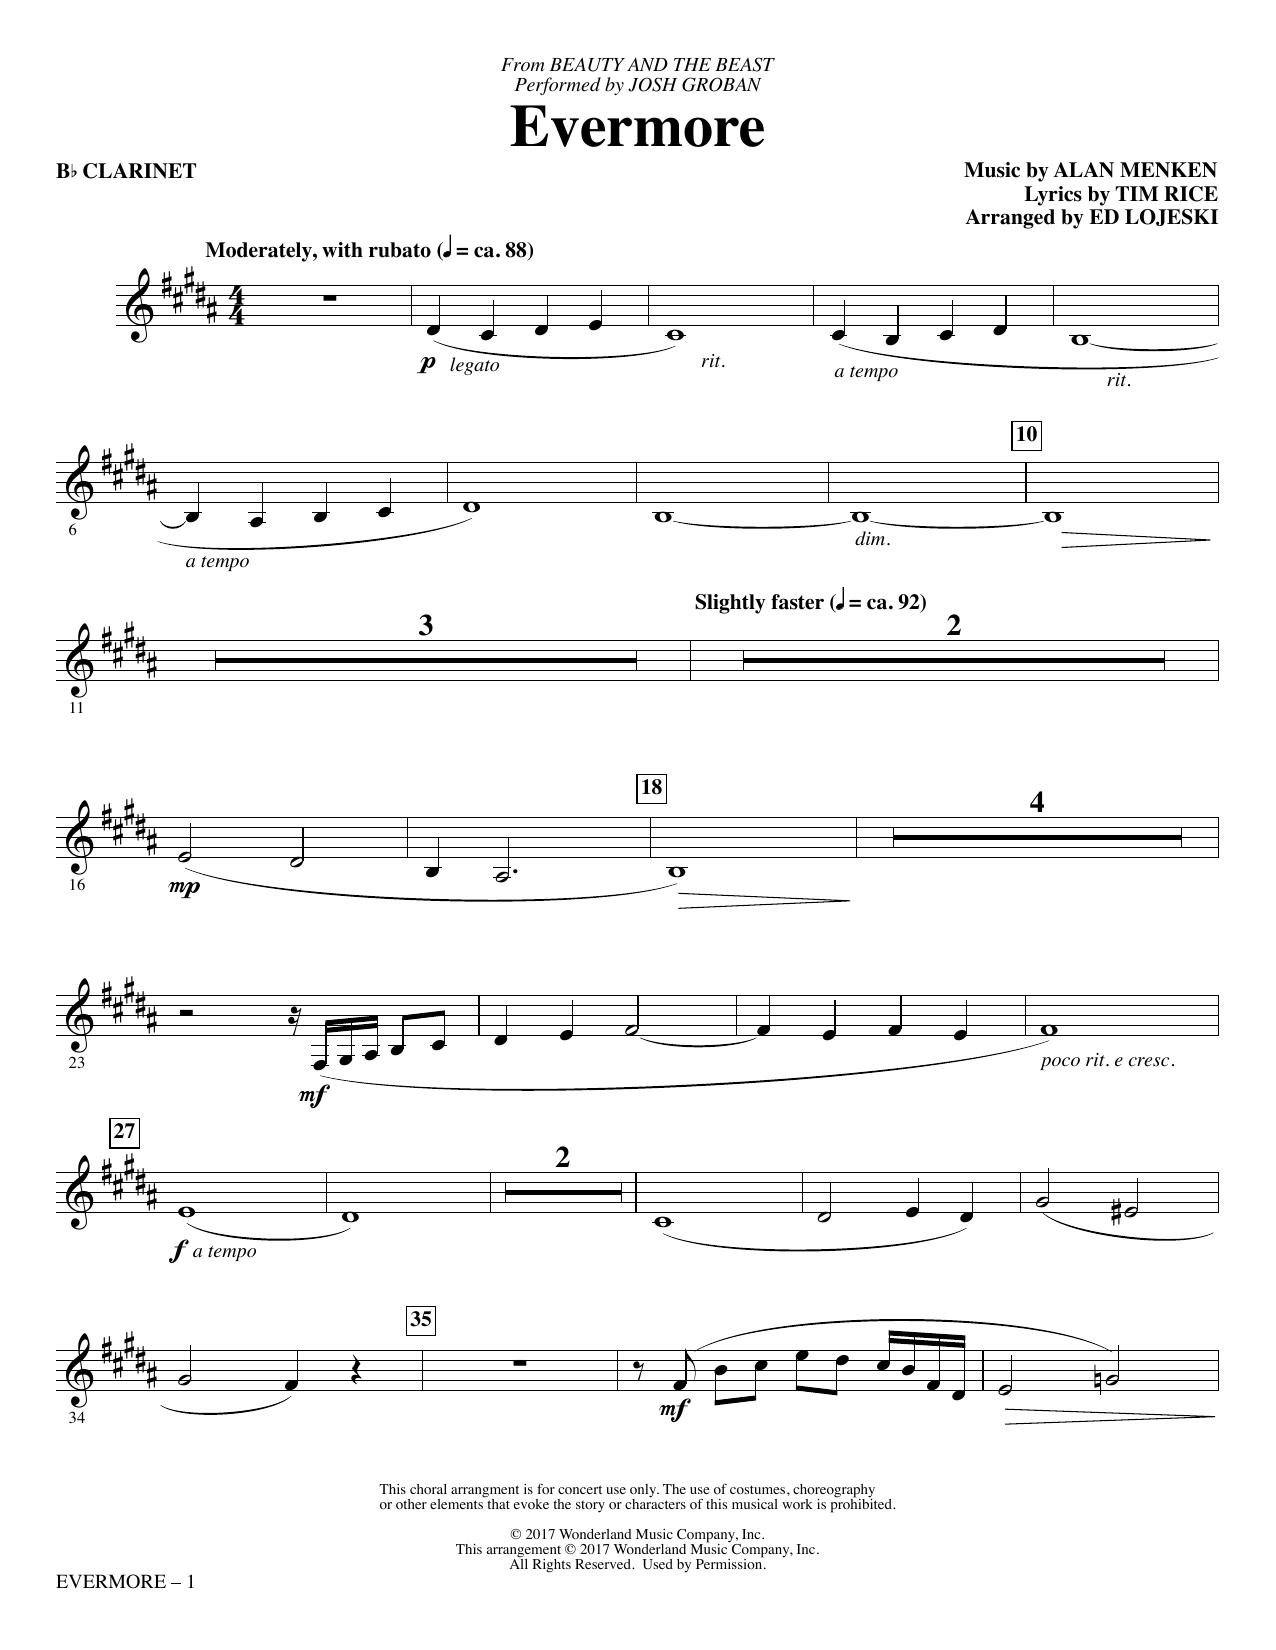 Josh Groban - Evermore - Bb Clarinet